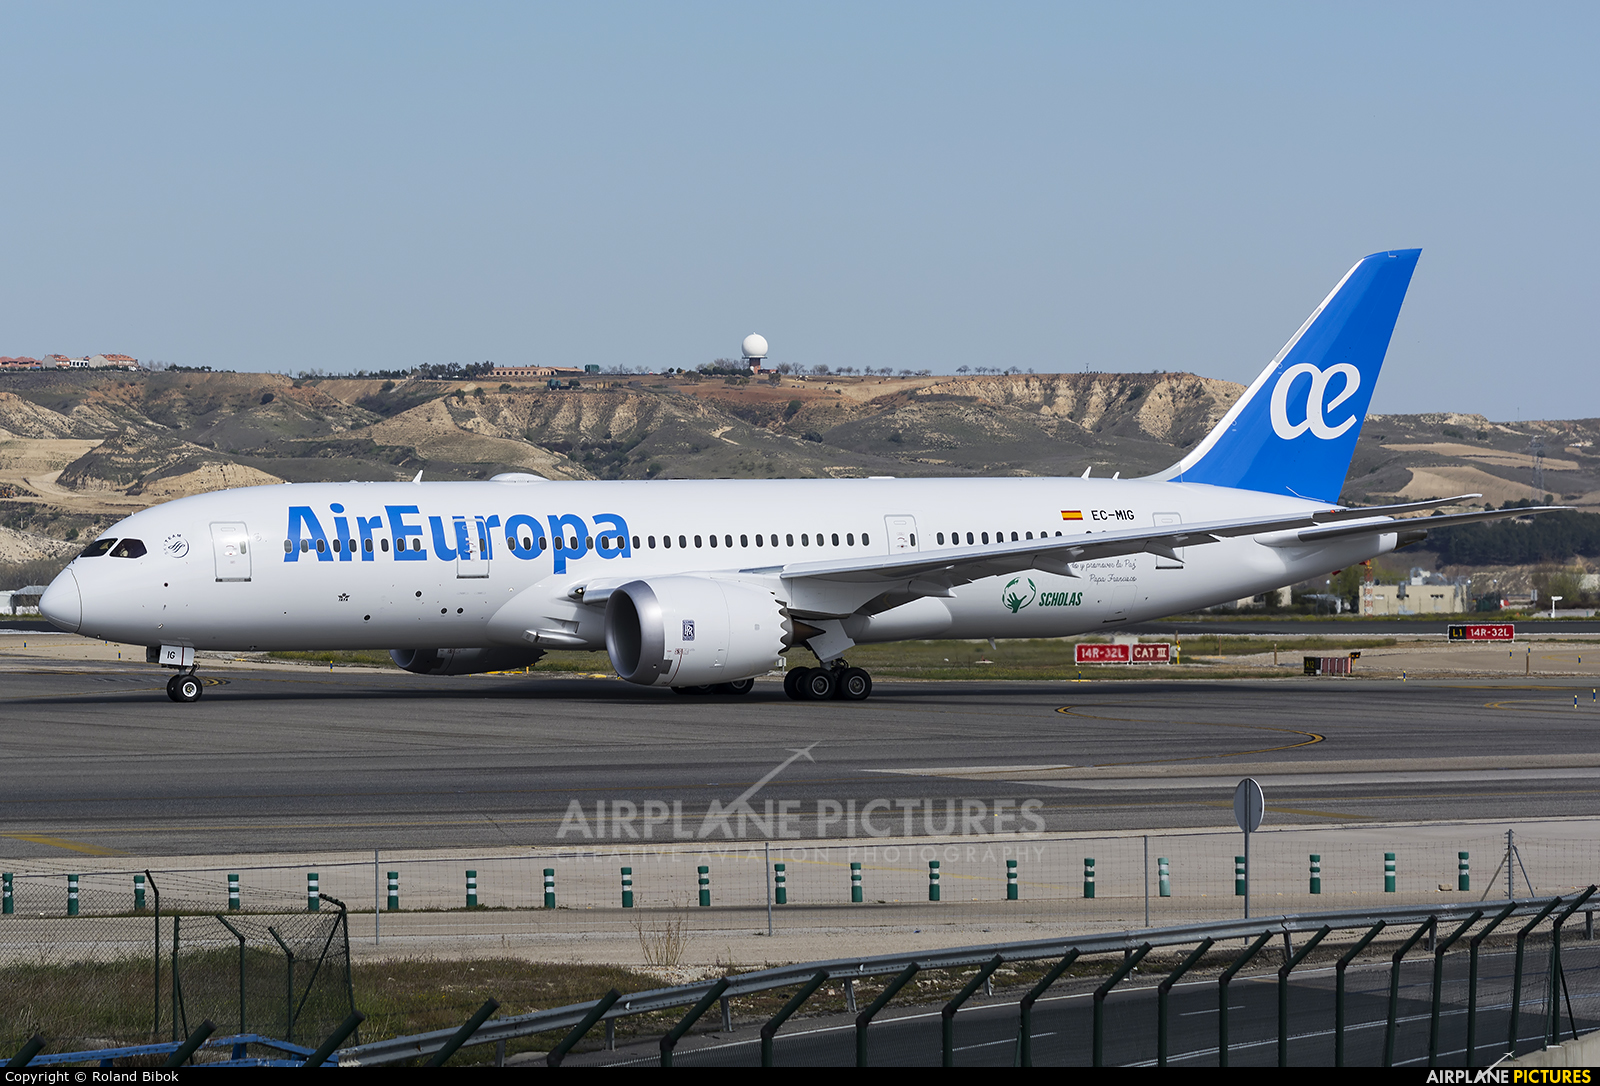 Ec mig air europa boeing 787 8 dreamliner at madrid for Interior 787 air europa